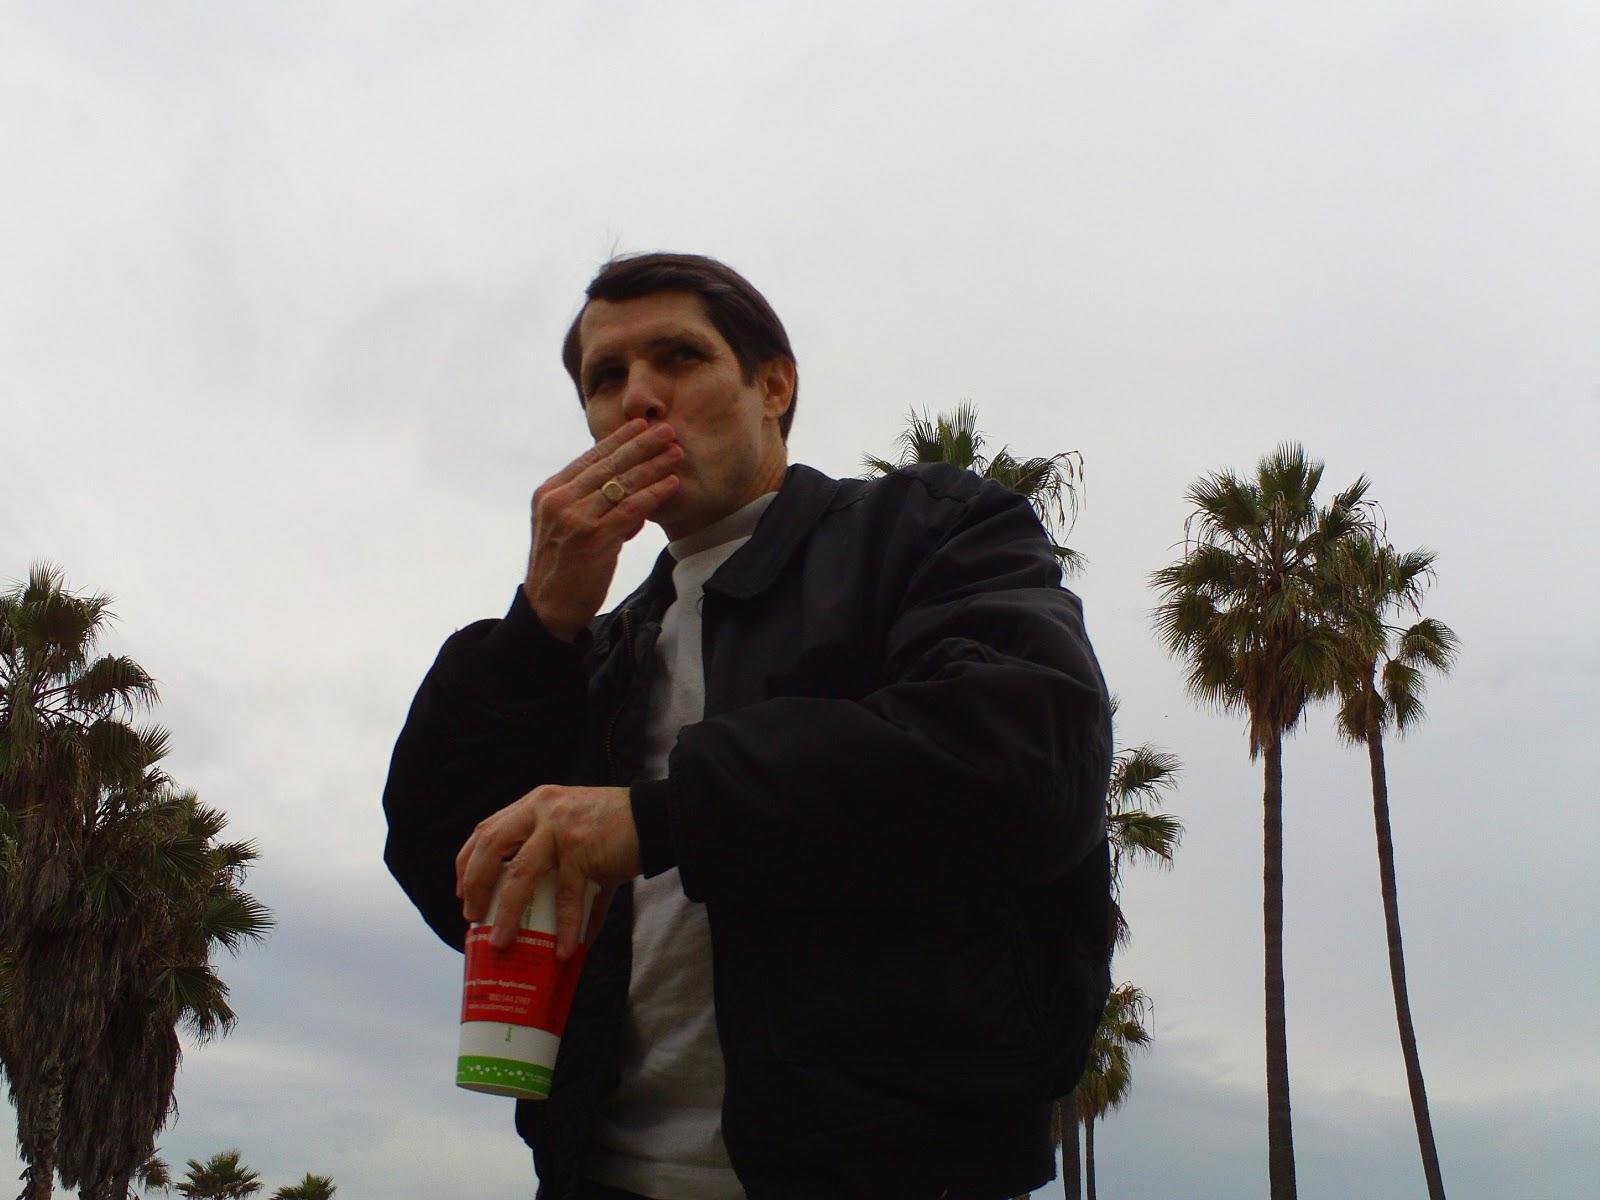 Jayson Pida at Boardwalk